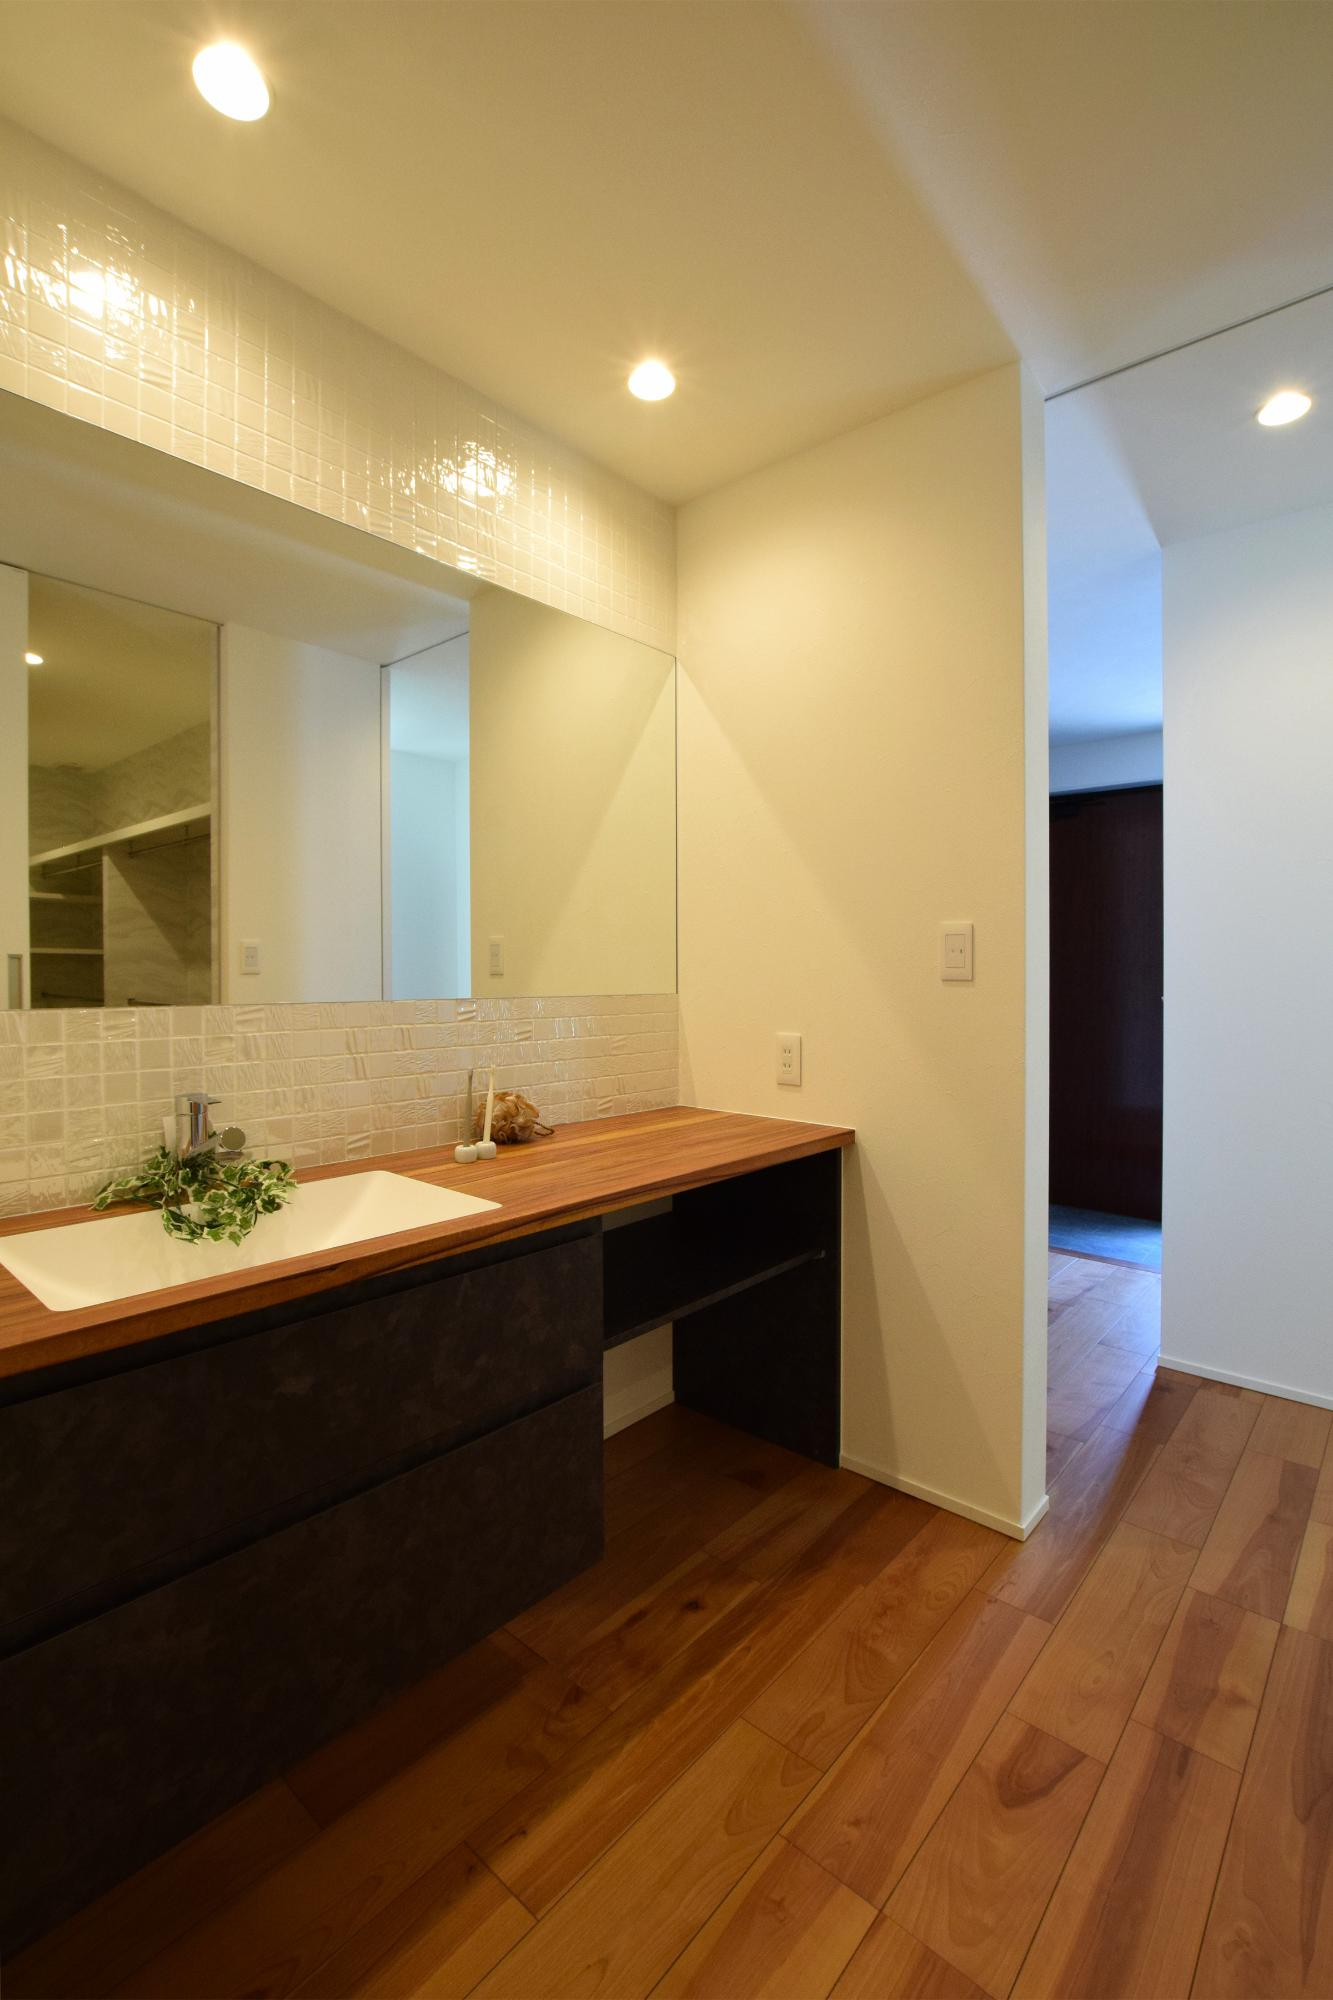 DETAIL HOME(ディテールホーム)「断熱材が2倍の全館空調の家」のシンプル・ナチュラル・モダンな洗面所・脱衣所の実例写真